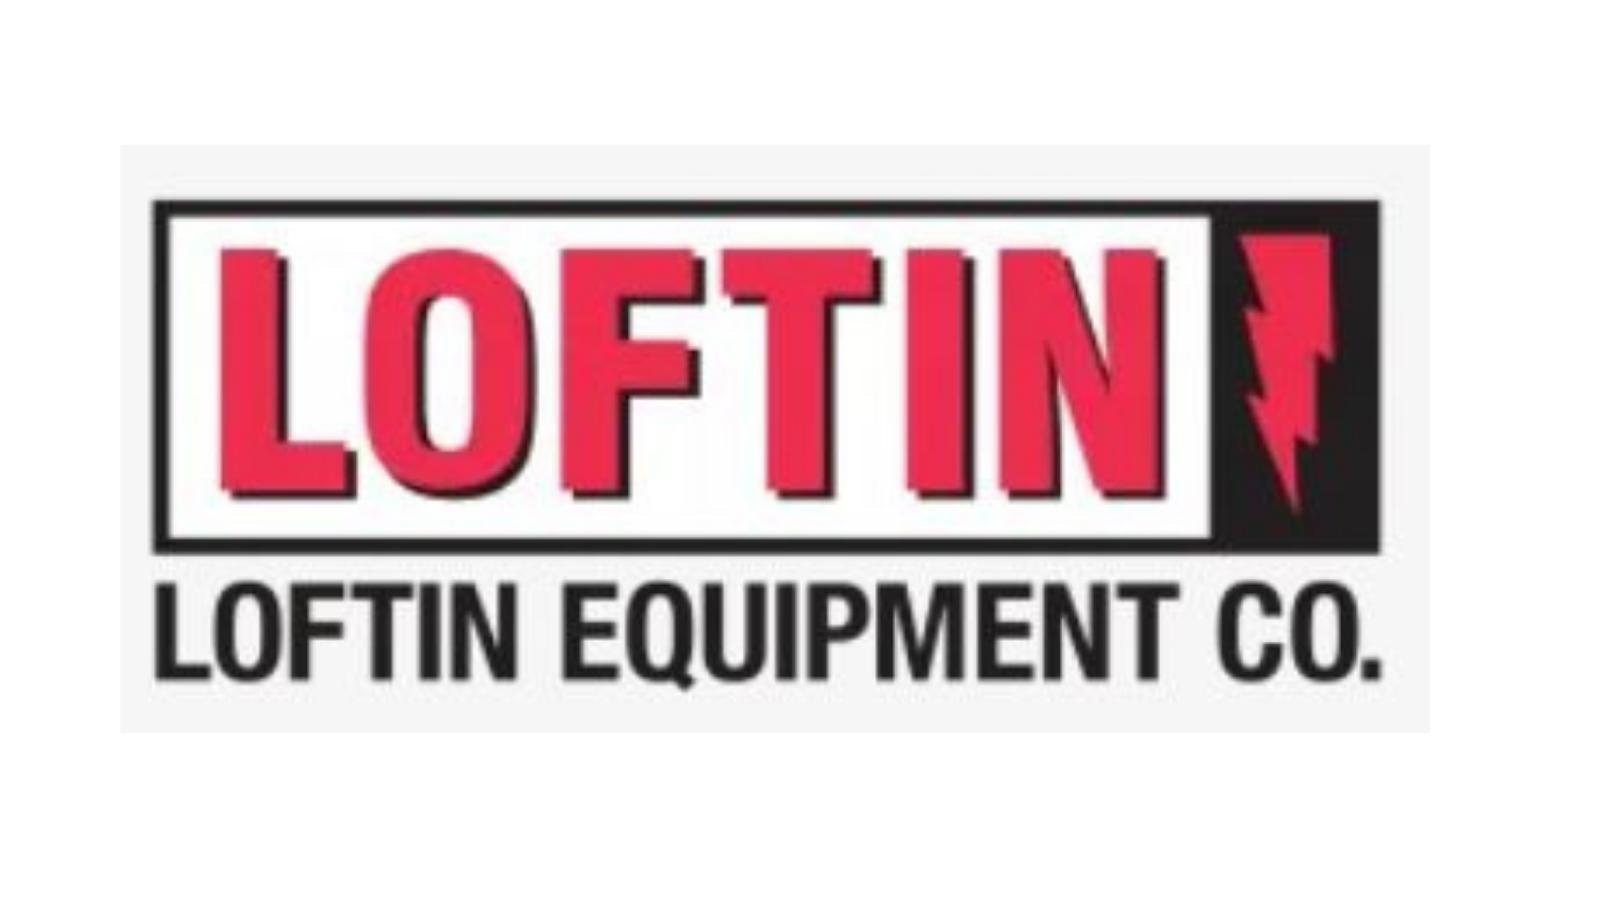 Loftin Equipment Company